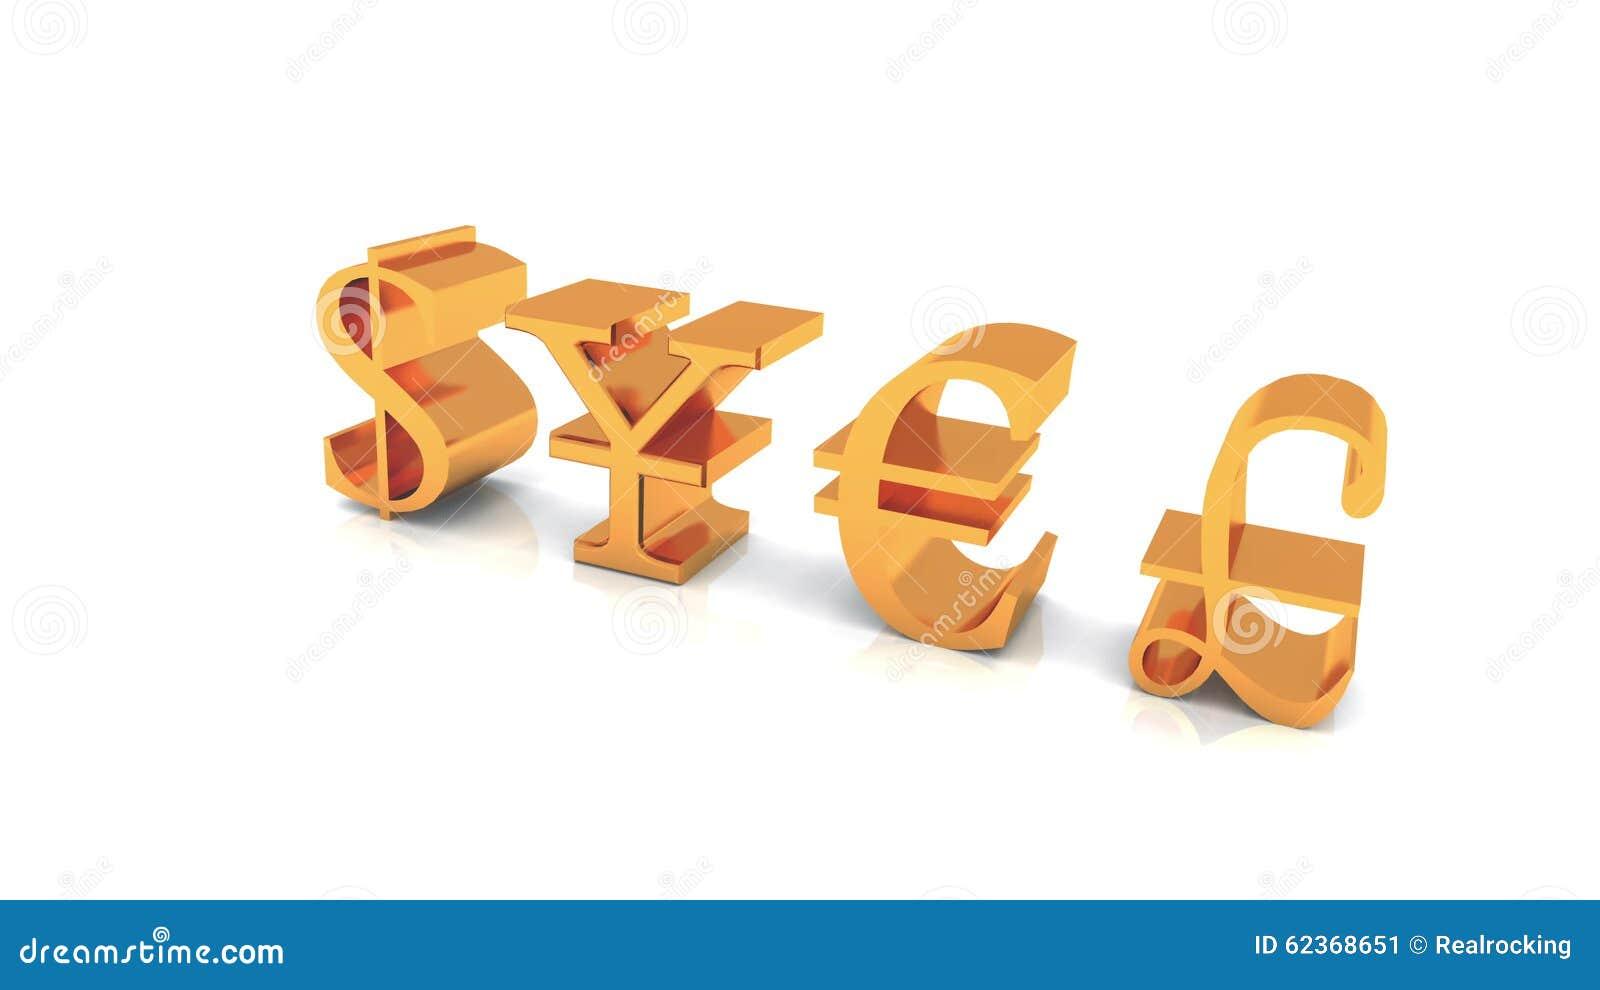 4k usa dollarschina rmbeurogbp symbolgolden metal sign stock 4k usa dollarschina rmbeurogbp symbolgolden metal sign stock video video of credit loan 62368651 biocorpaavc Gallery